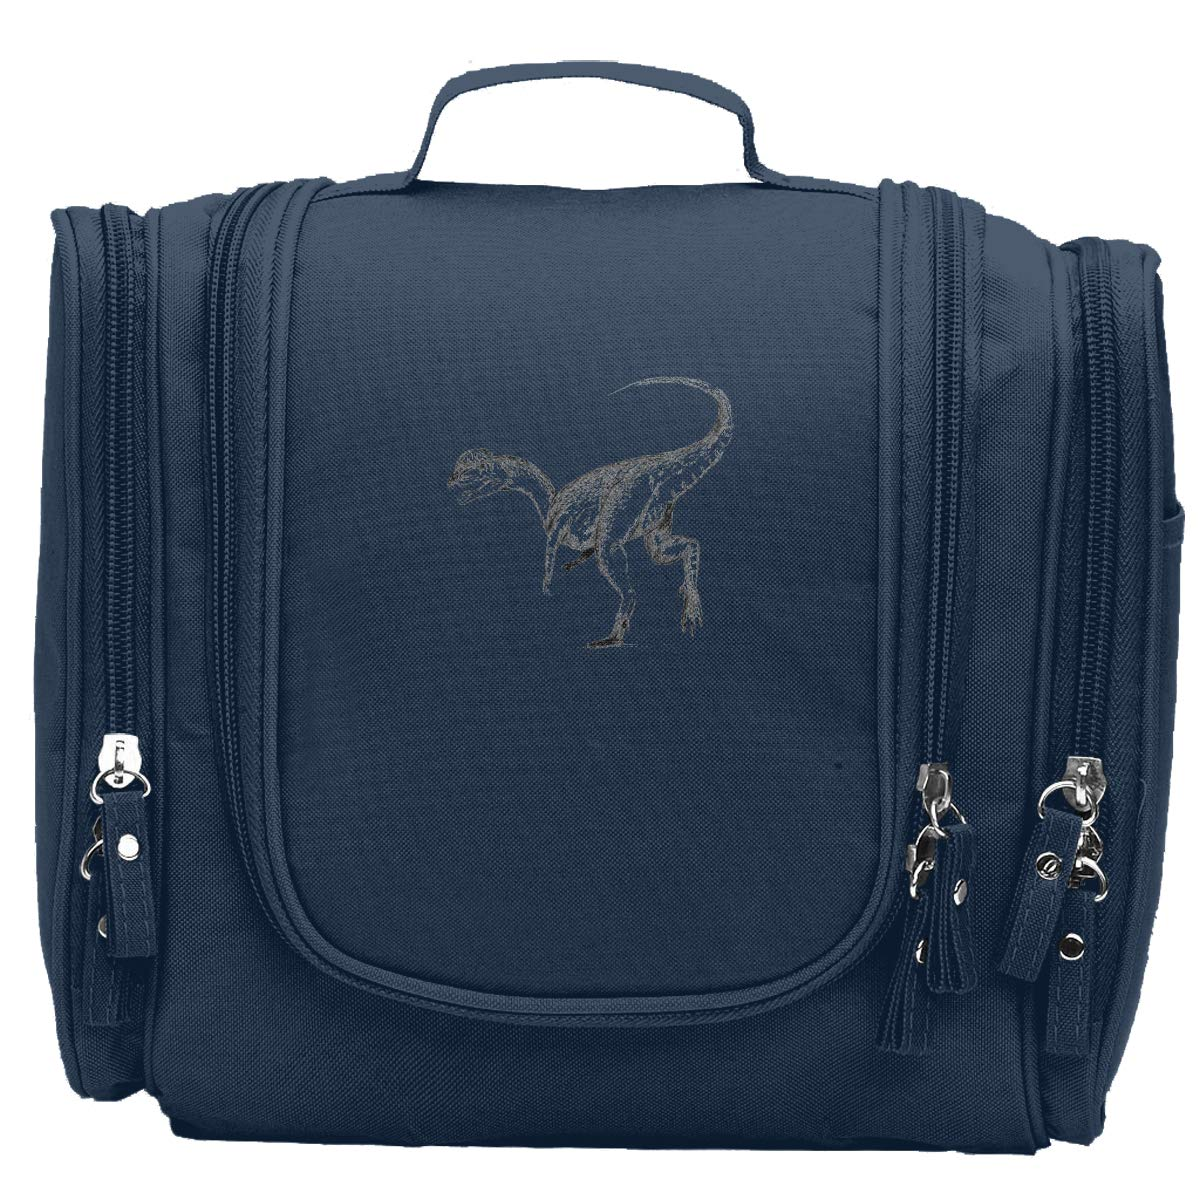 0d3795cfefda Amazon.com: Dinosaurs Large Travel Makeup Bags Multifunction ...